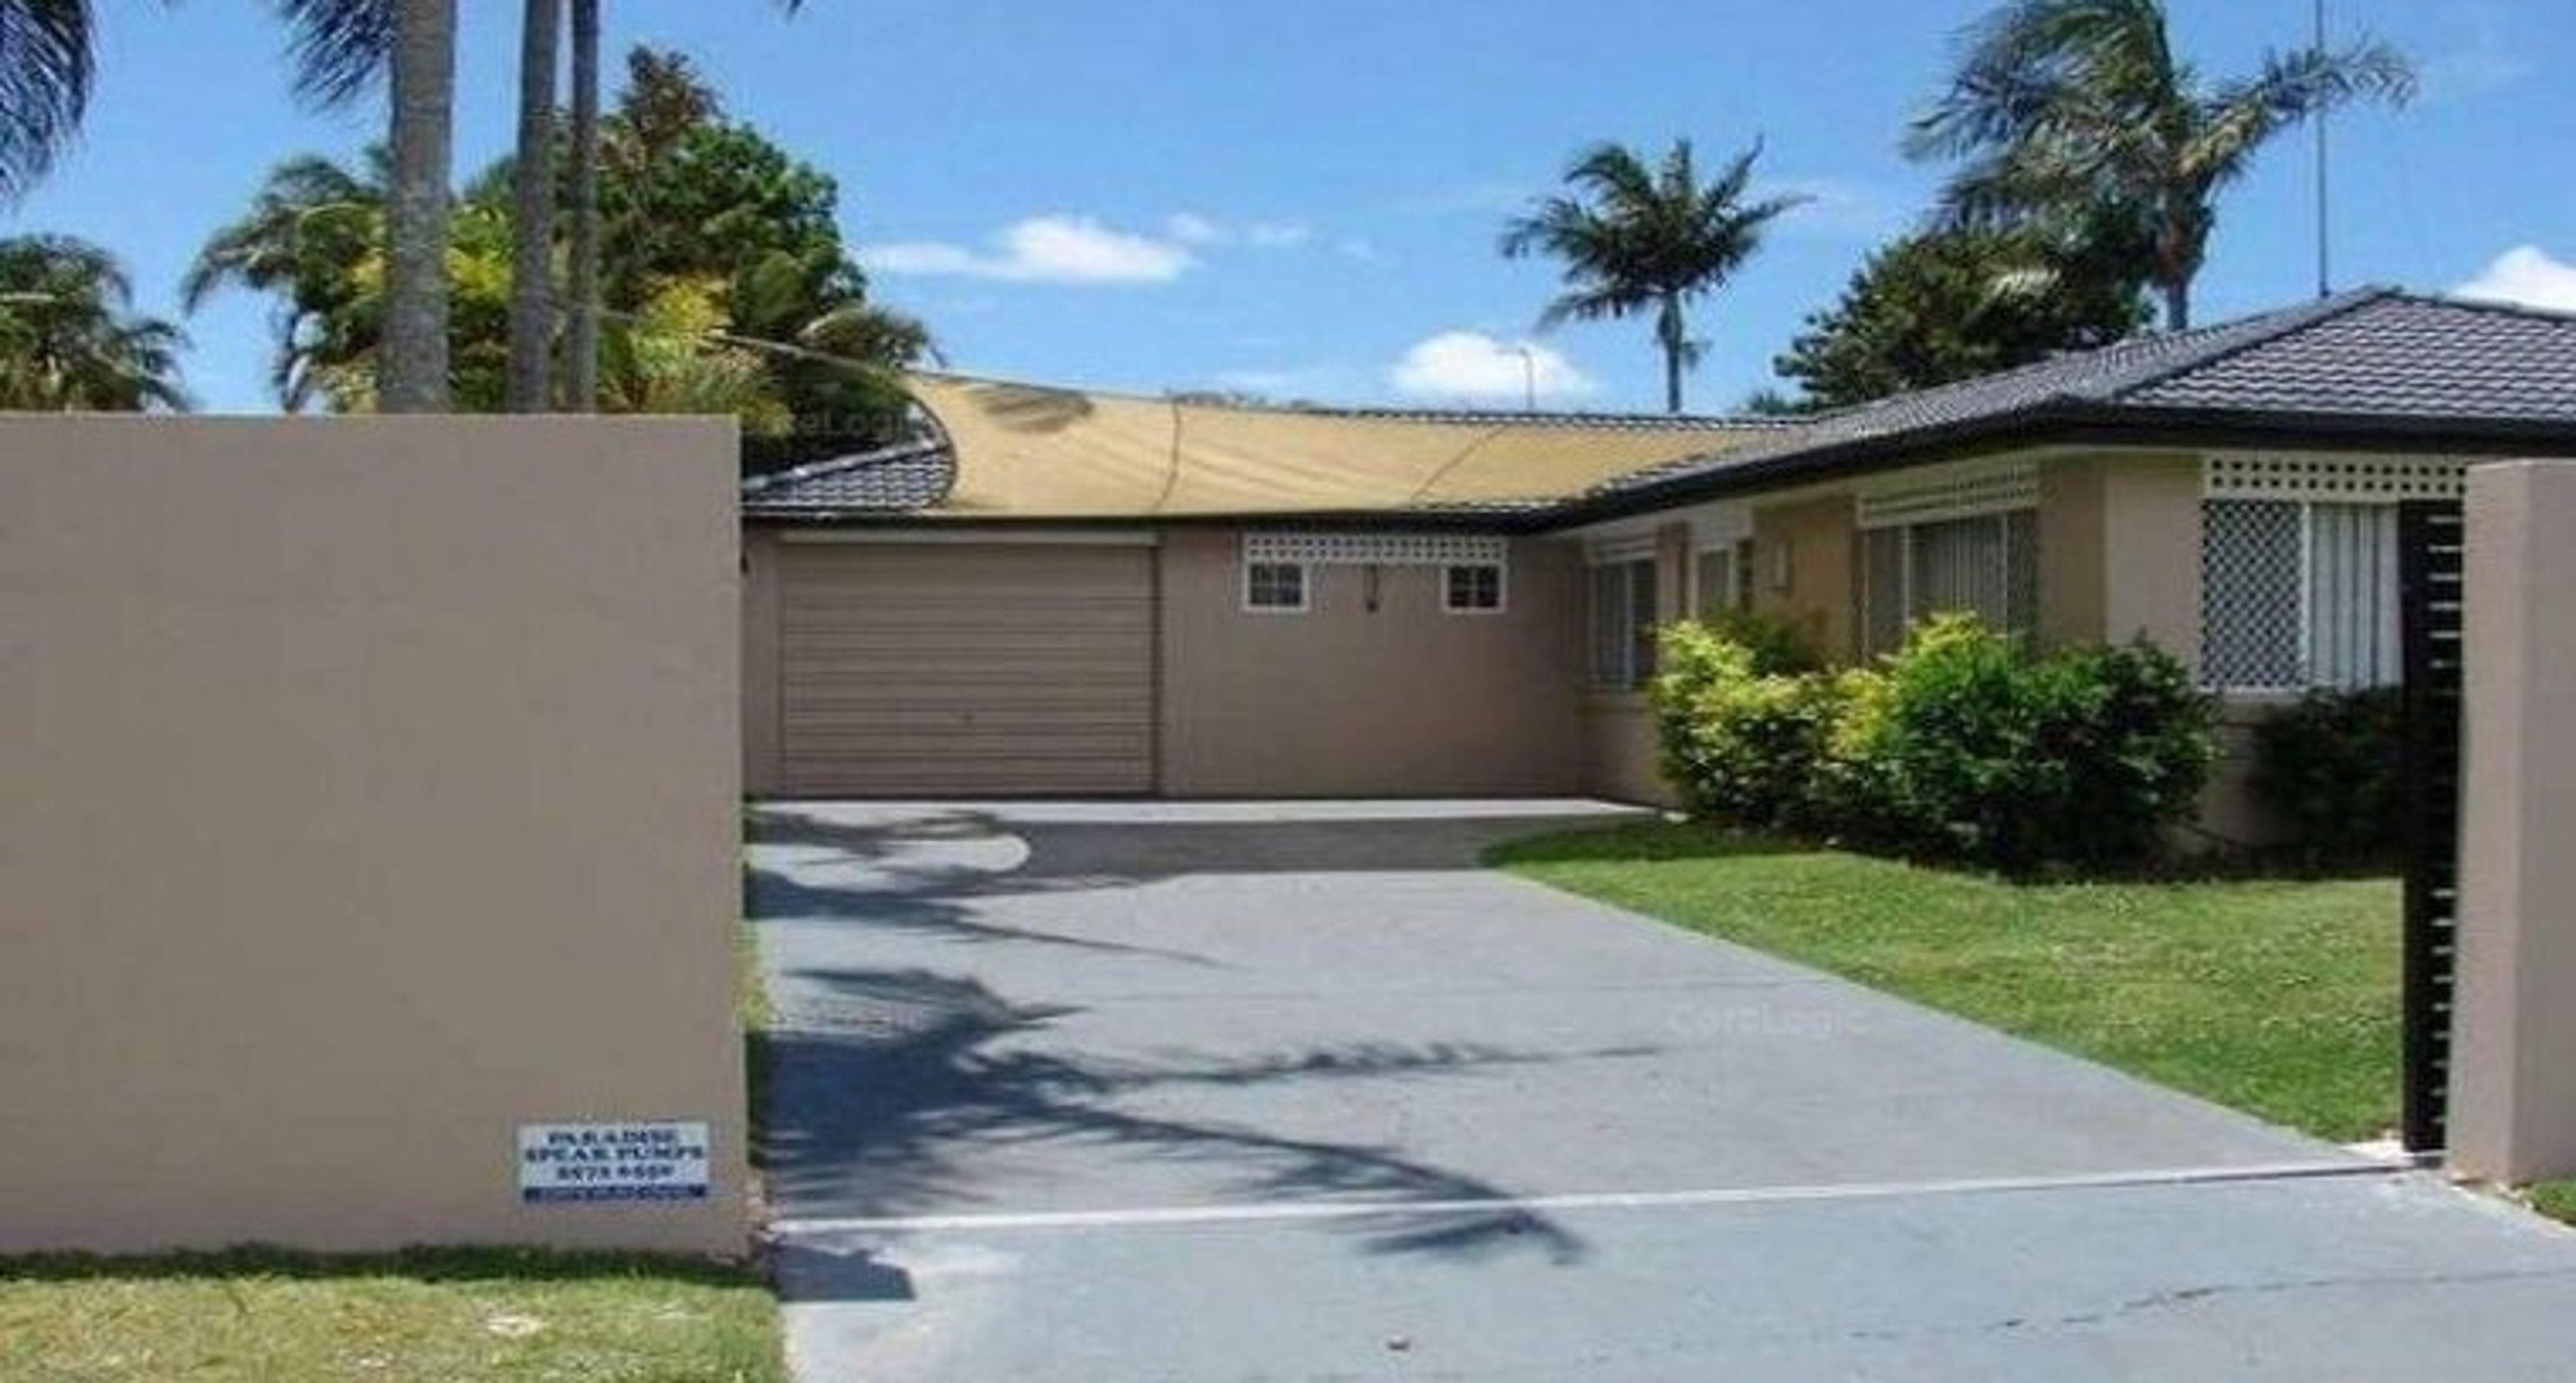 7 McCleary Street, Bundall, QLD 4217